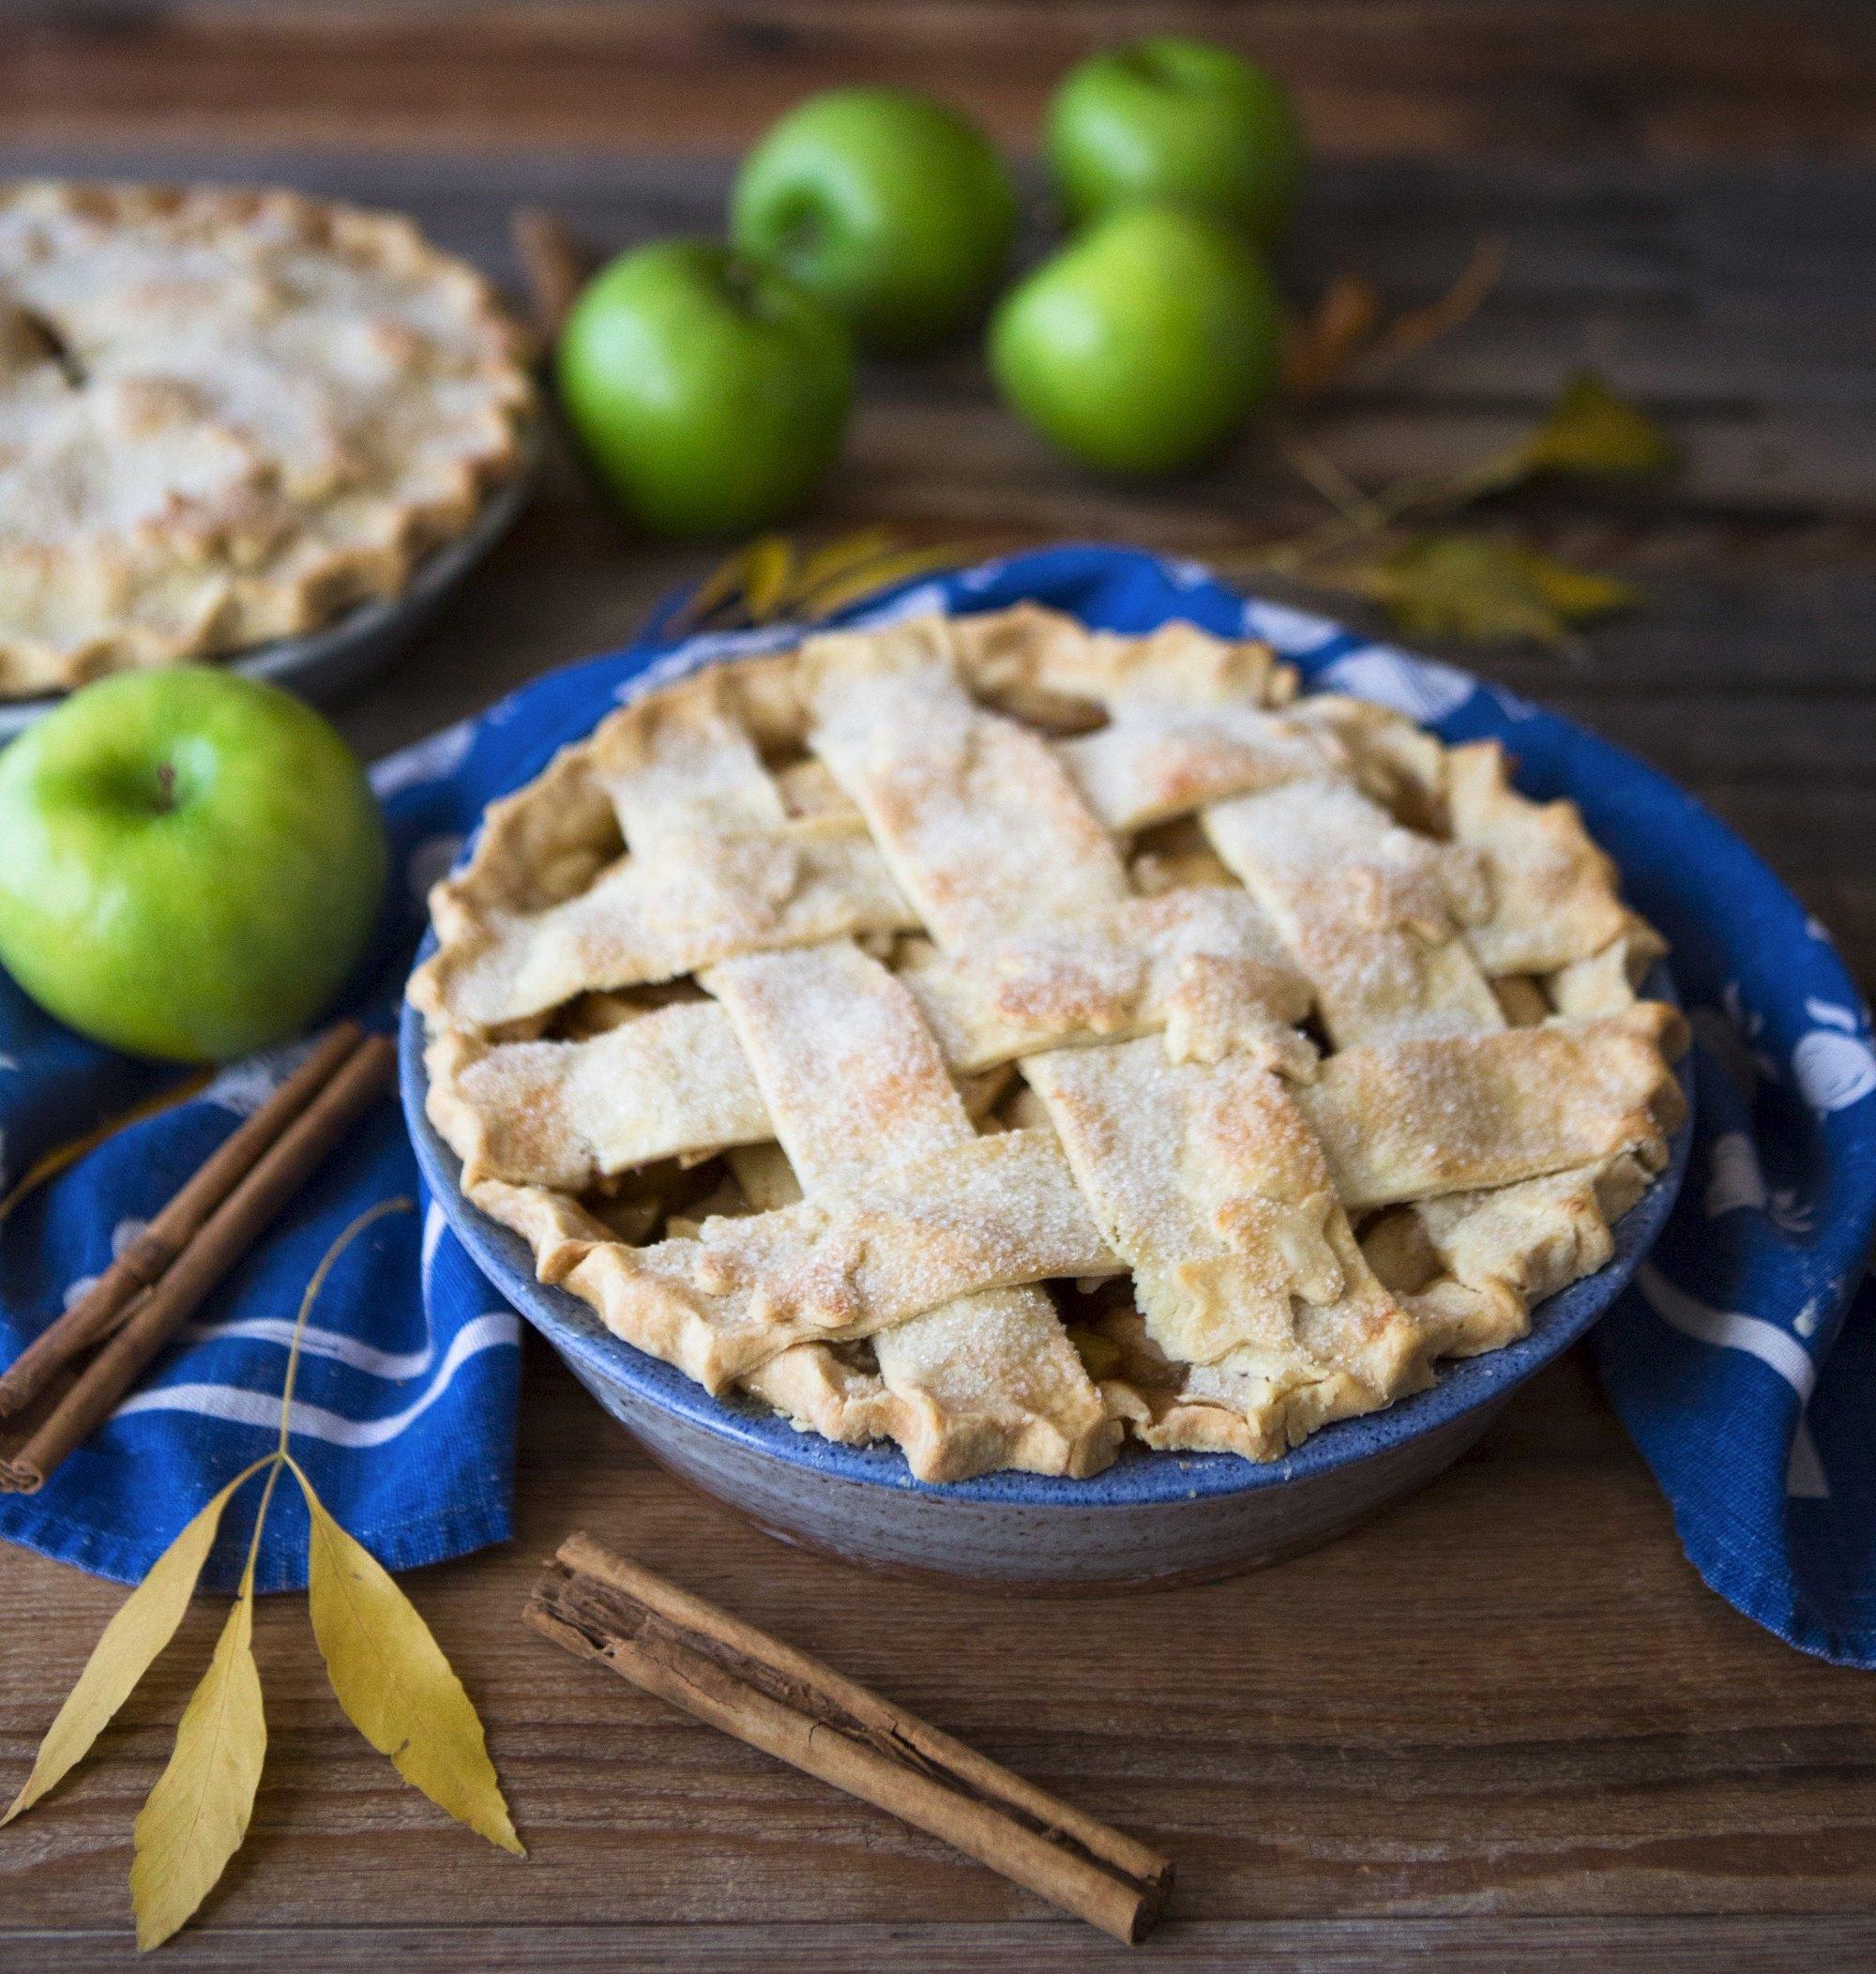 Apple pie Ricetta dolce americano -